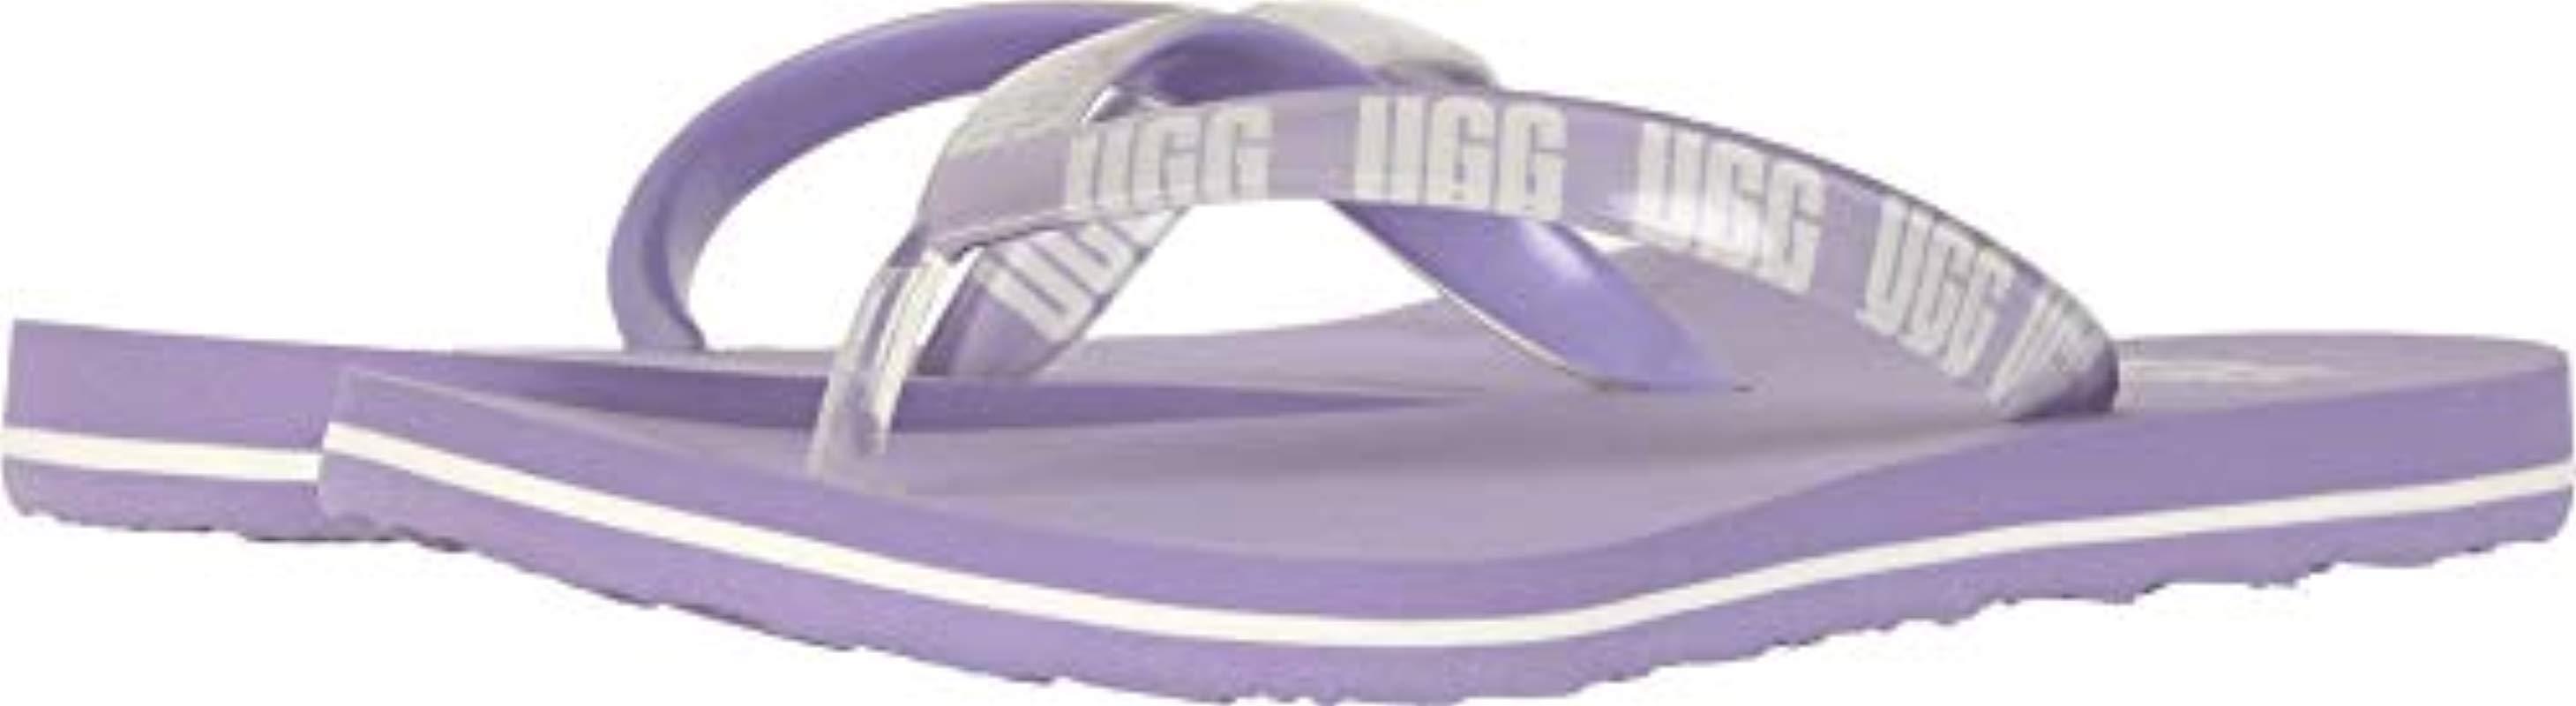 3b15feba130 Lyst - UGG Simi Graphic Flip-flop in Purple